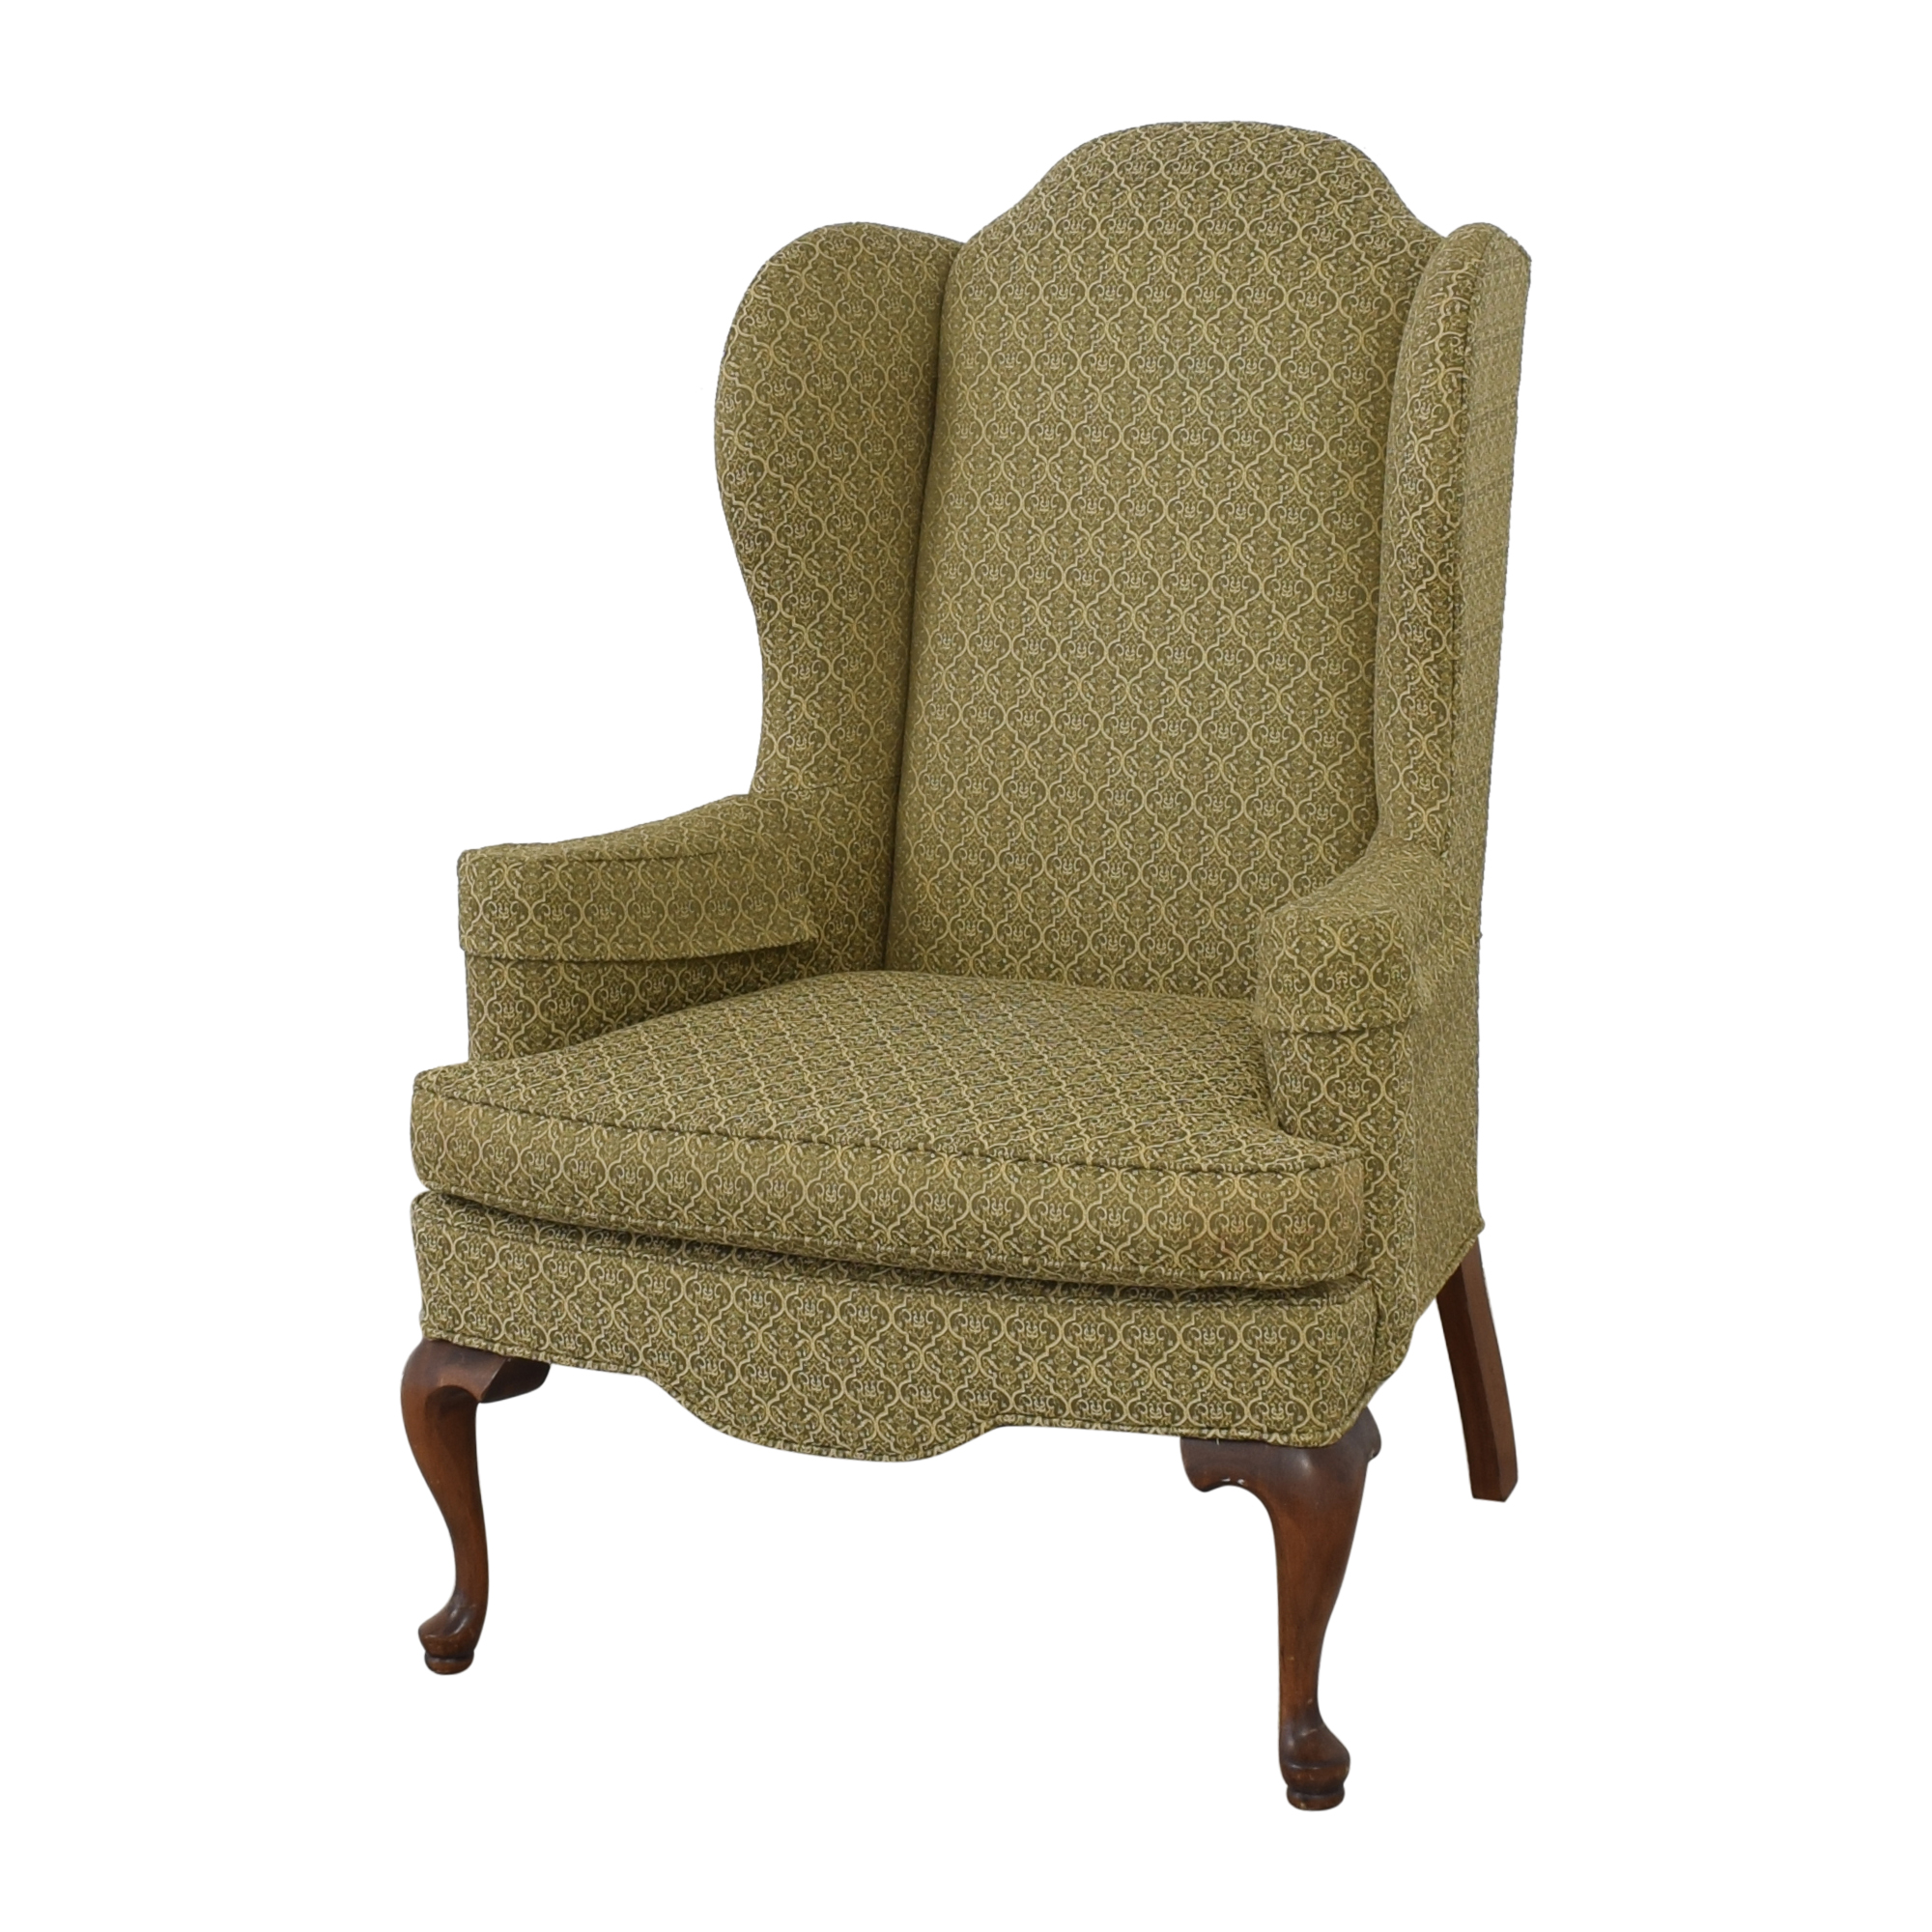 Ethan Allen Ethan Allen Queen Anne Wing Chair nj